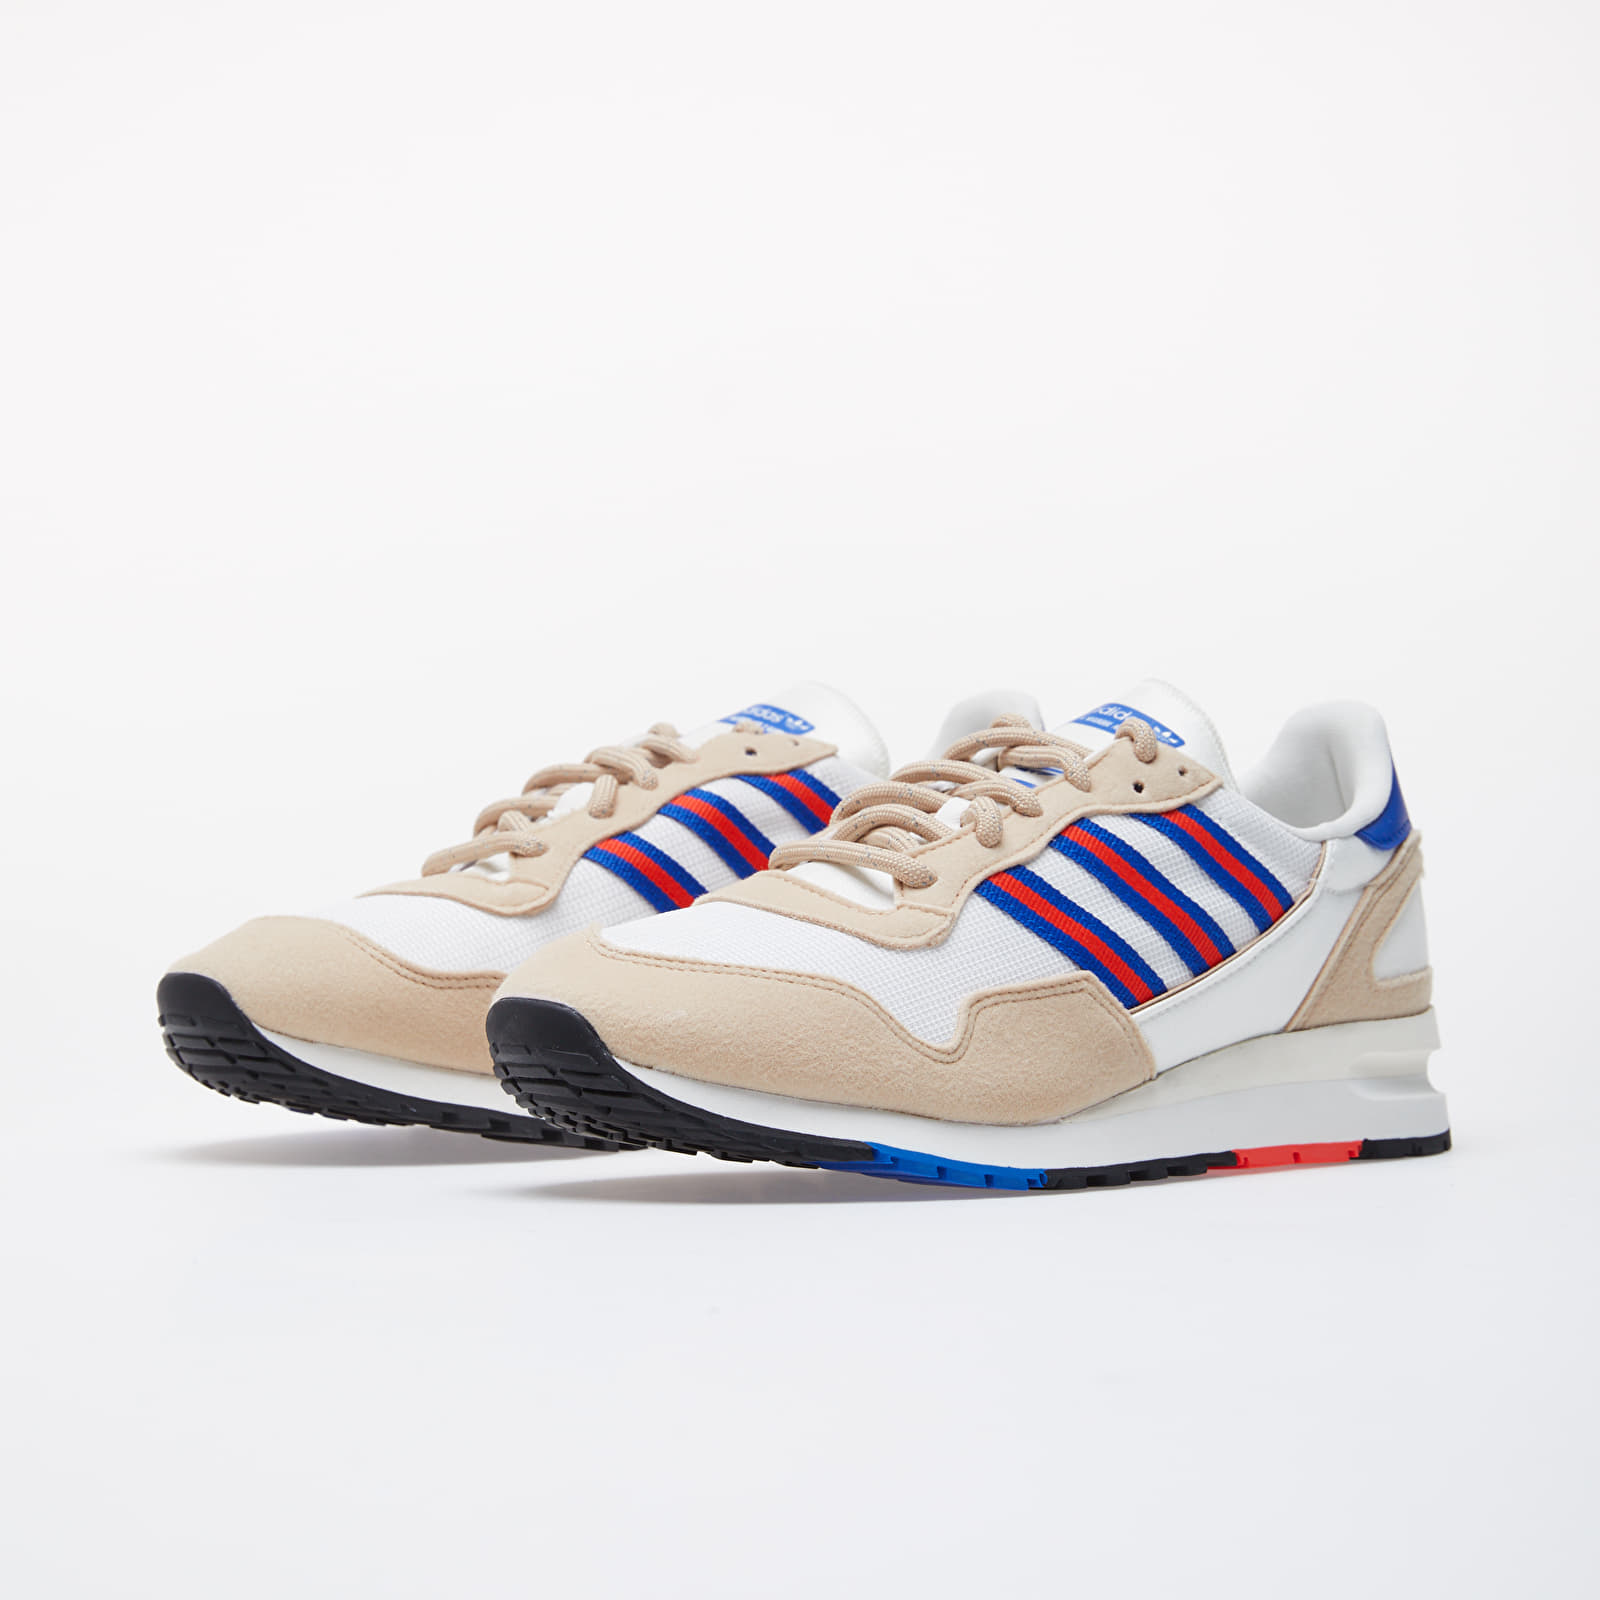 Férfi cipők adidas Lowertree Collegiate Navy Crystal White